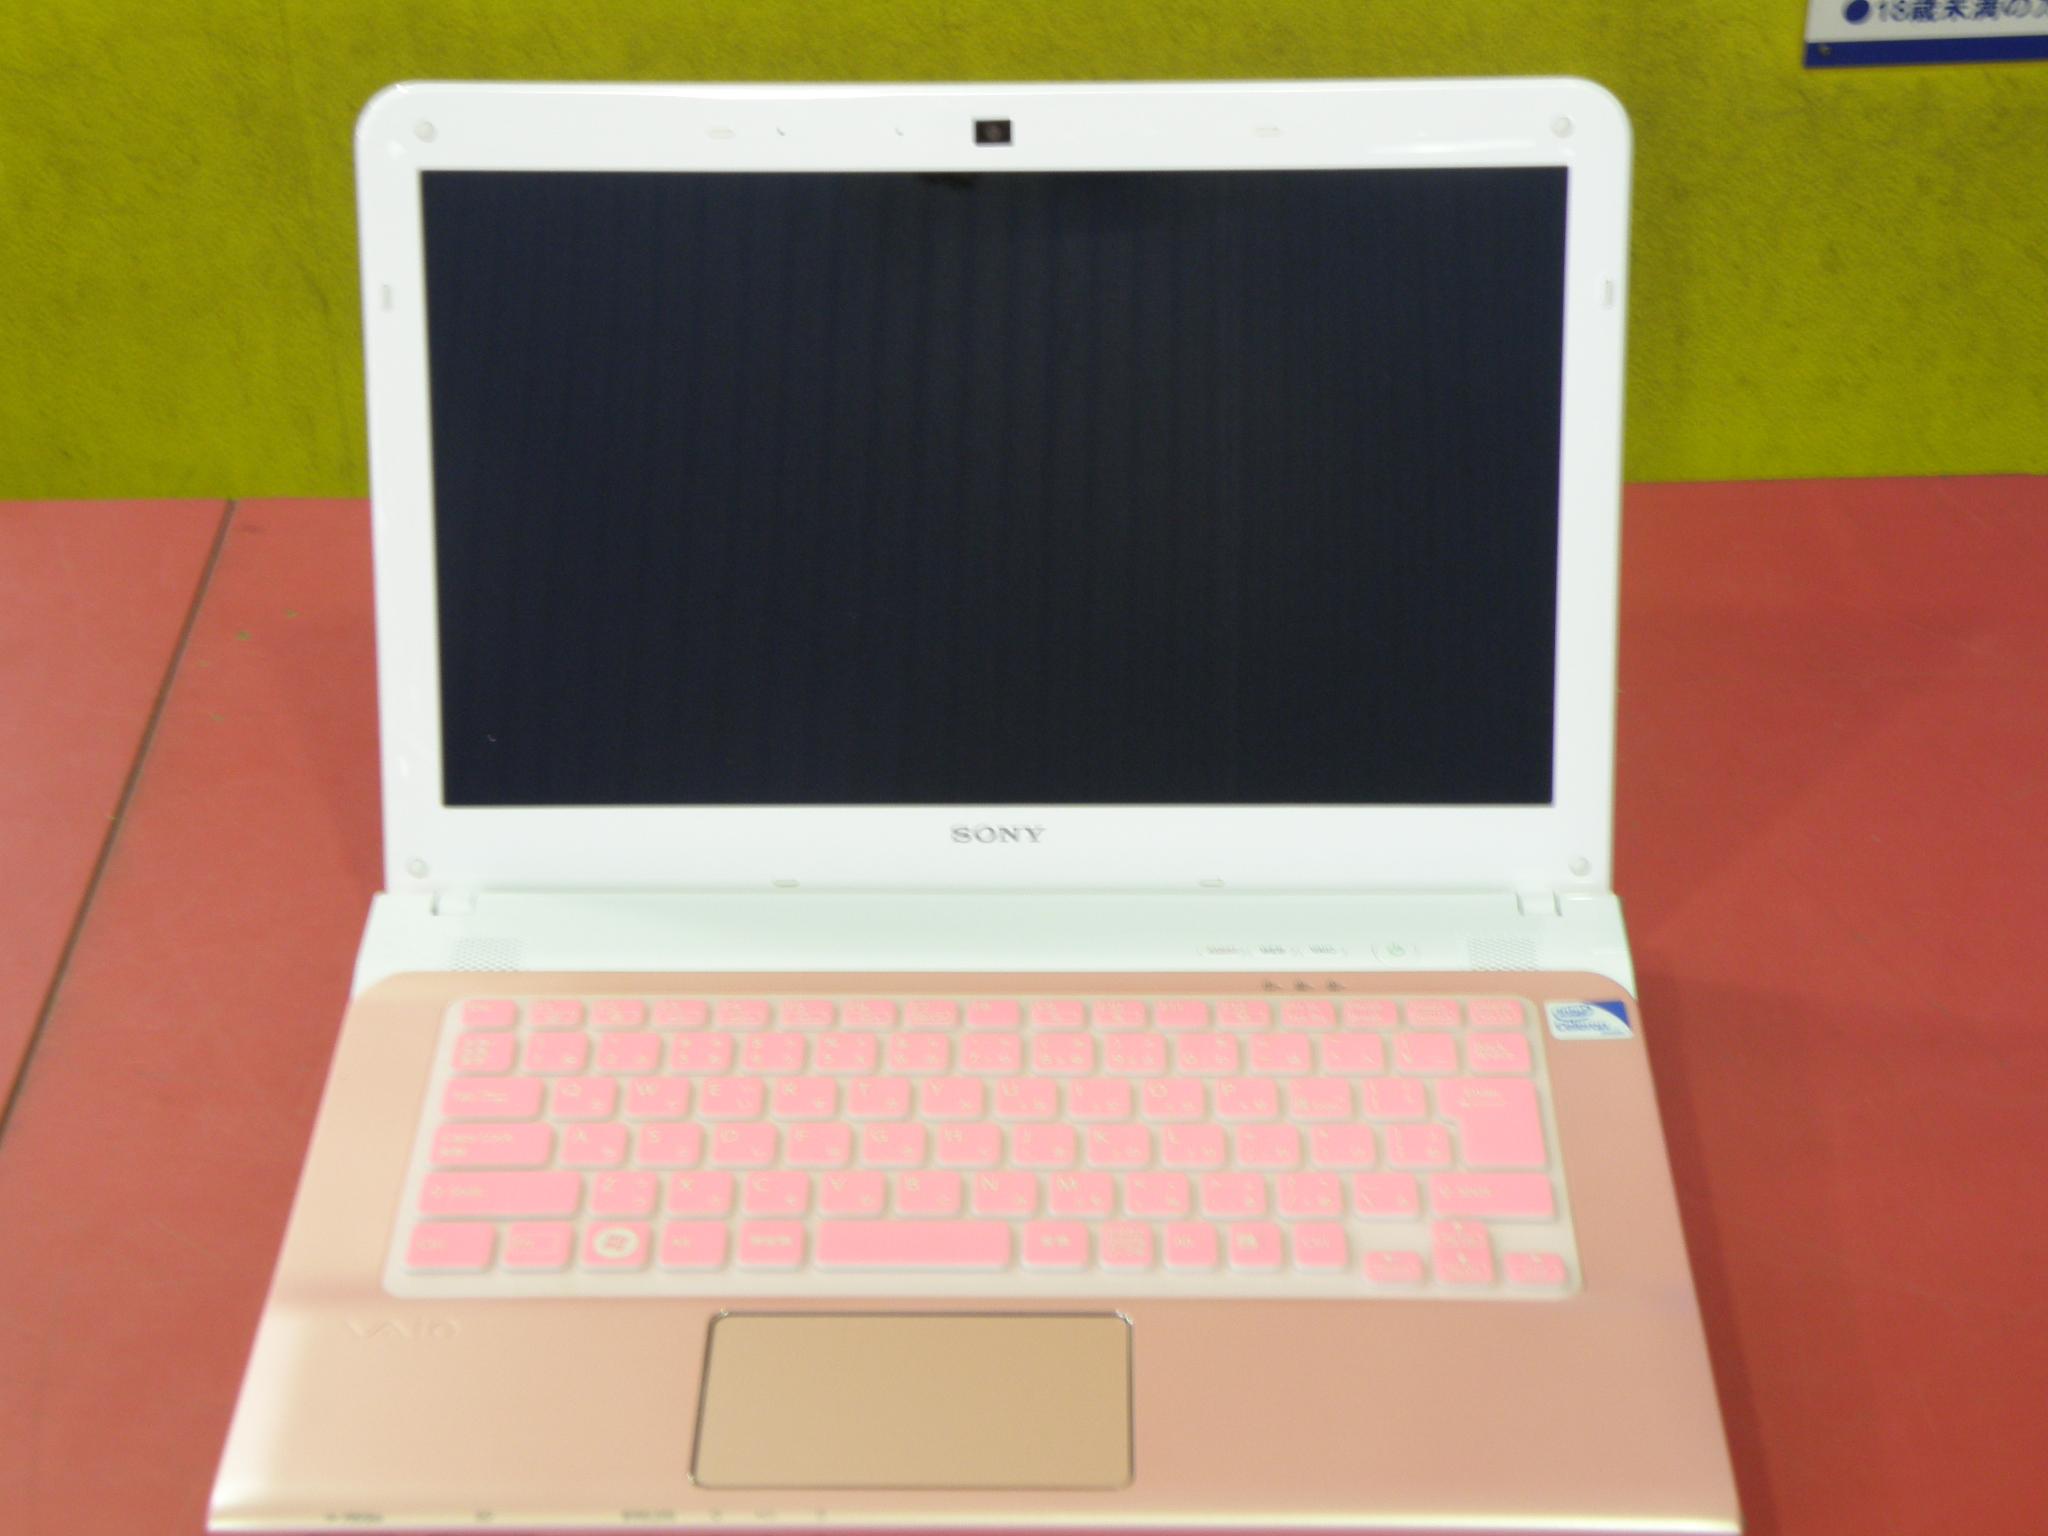 SONYノートパソコン買取|名古屋リサイクルショップ ハードオフ安城